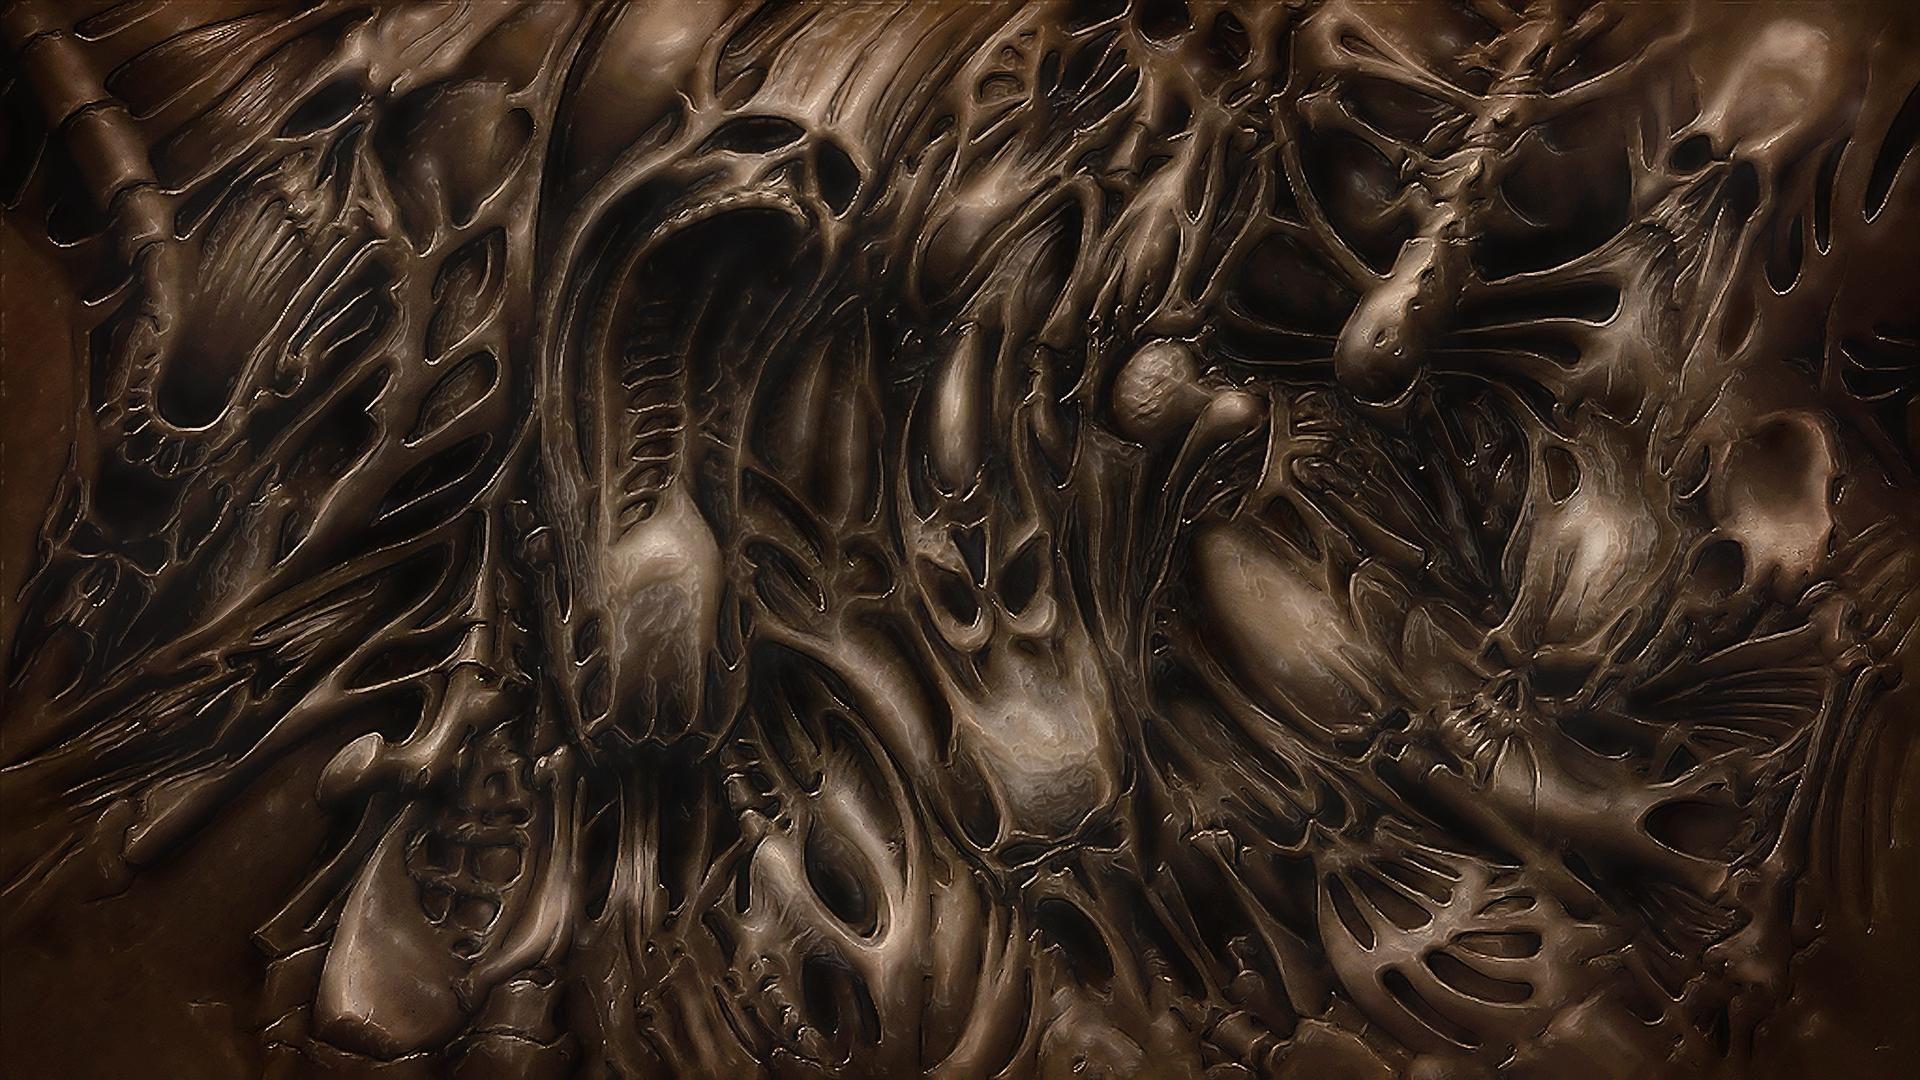 Download This Awesome Wallpaper Hr Giger Art Doom Stoner Rock